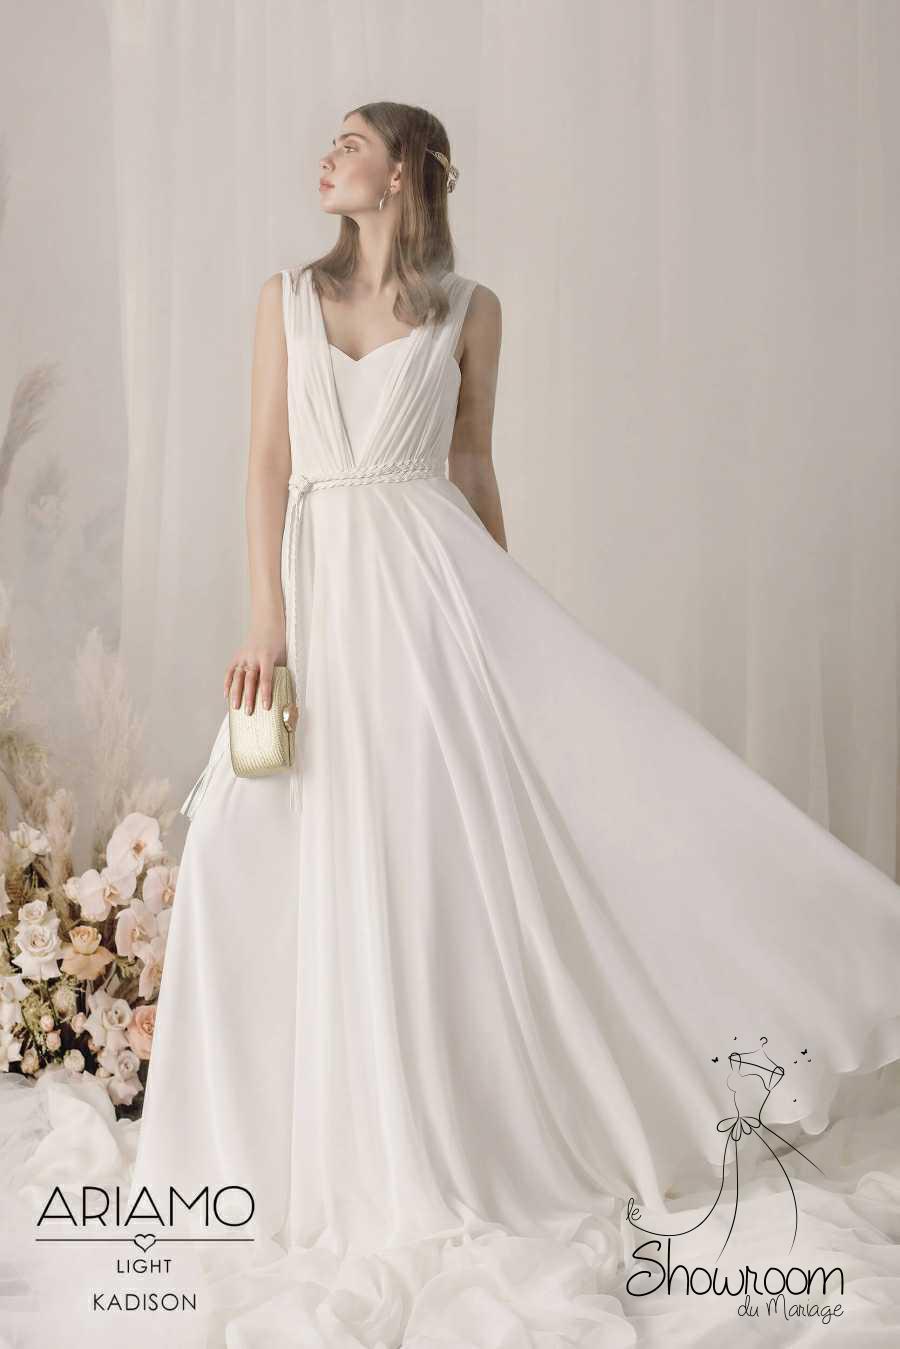 Robes de mariée Kadison : 739€